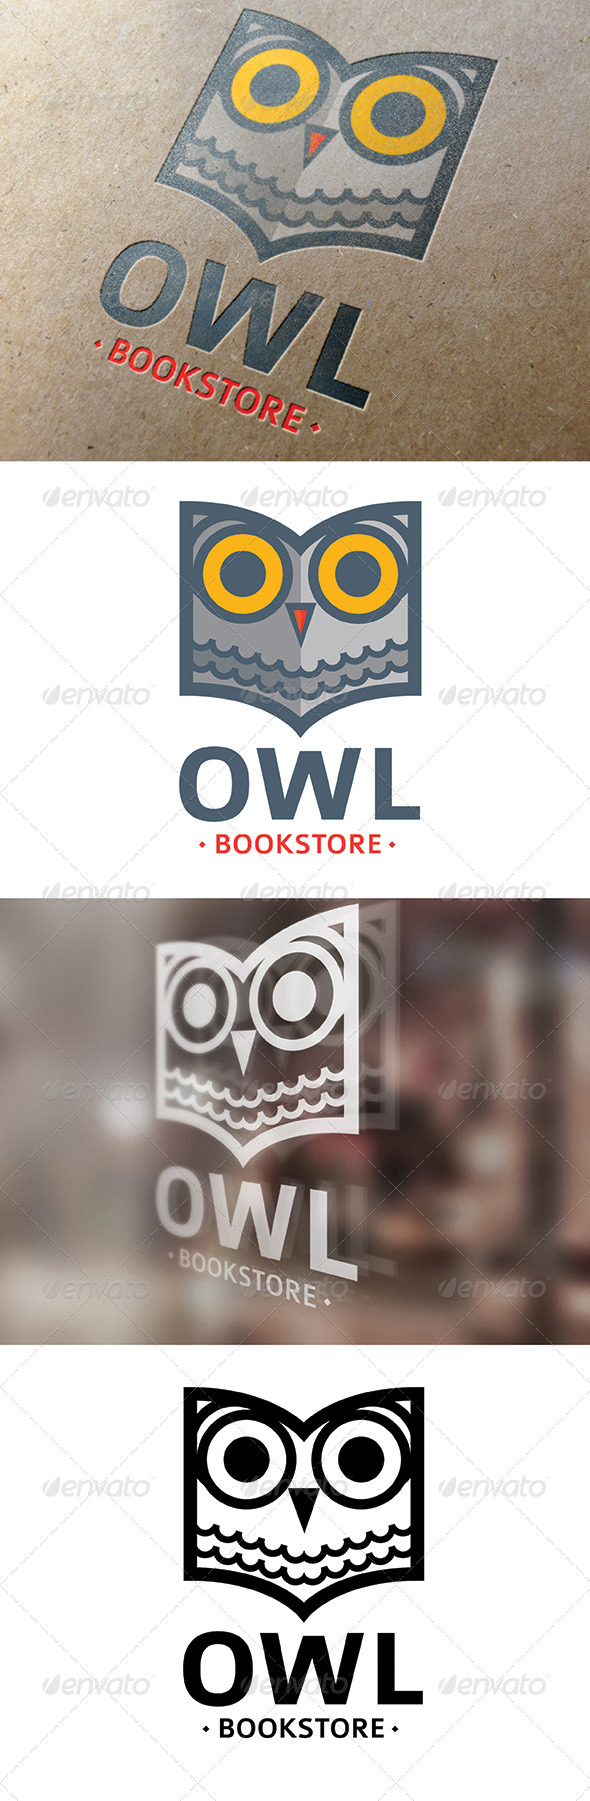 GraphicRiver Owl Bookstore Logo 8014577